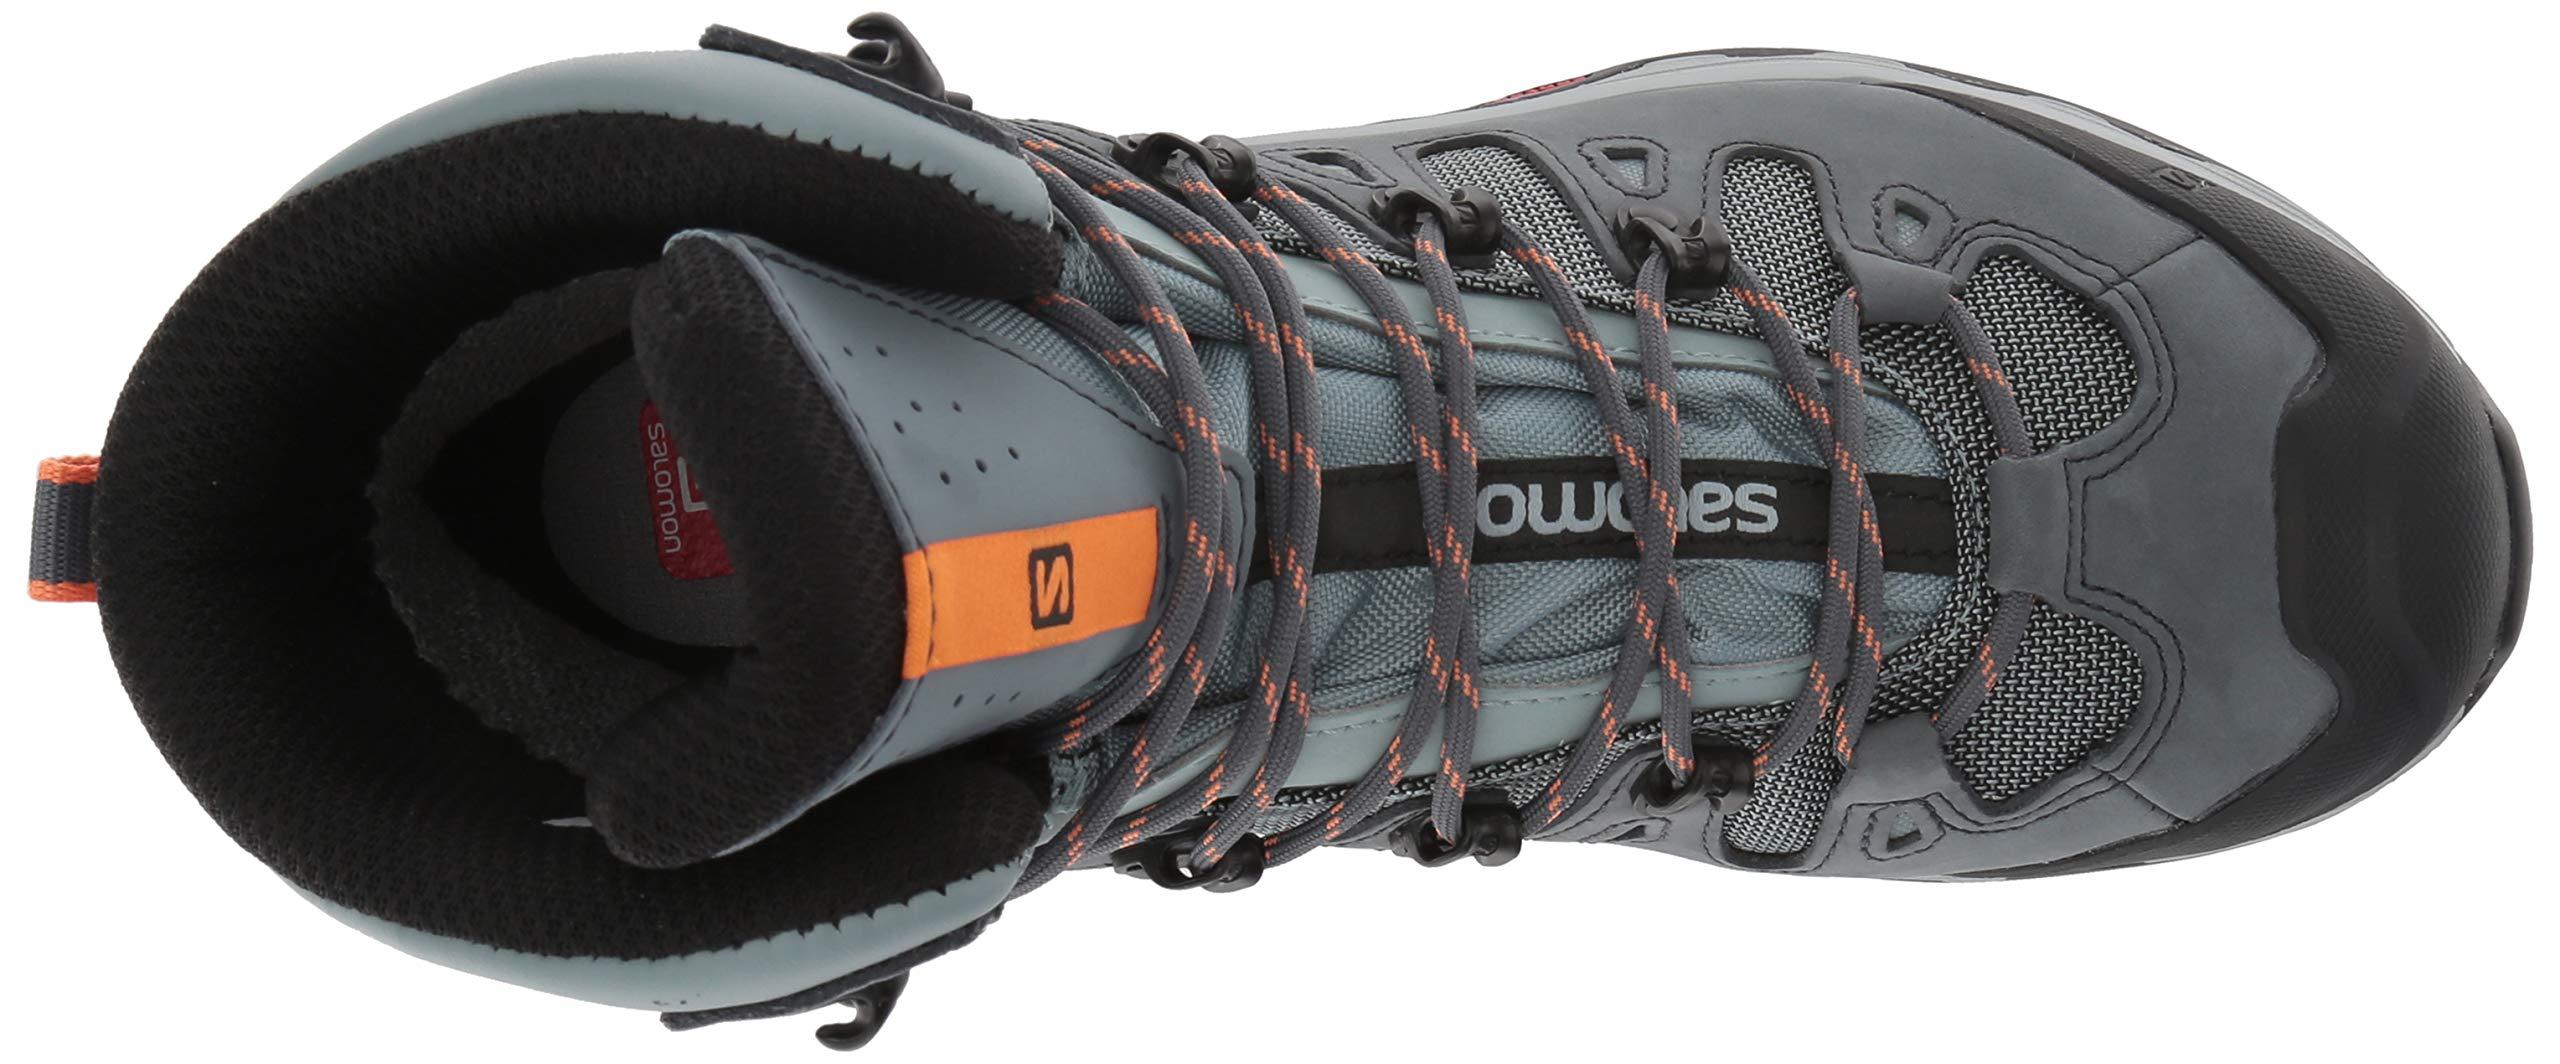 SALOMON Women's Quest 4d 3 GTX W High Rise Hiking Boots 8